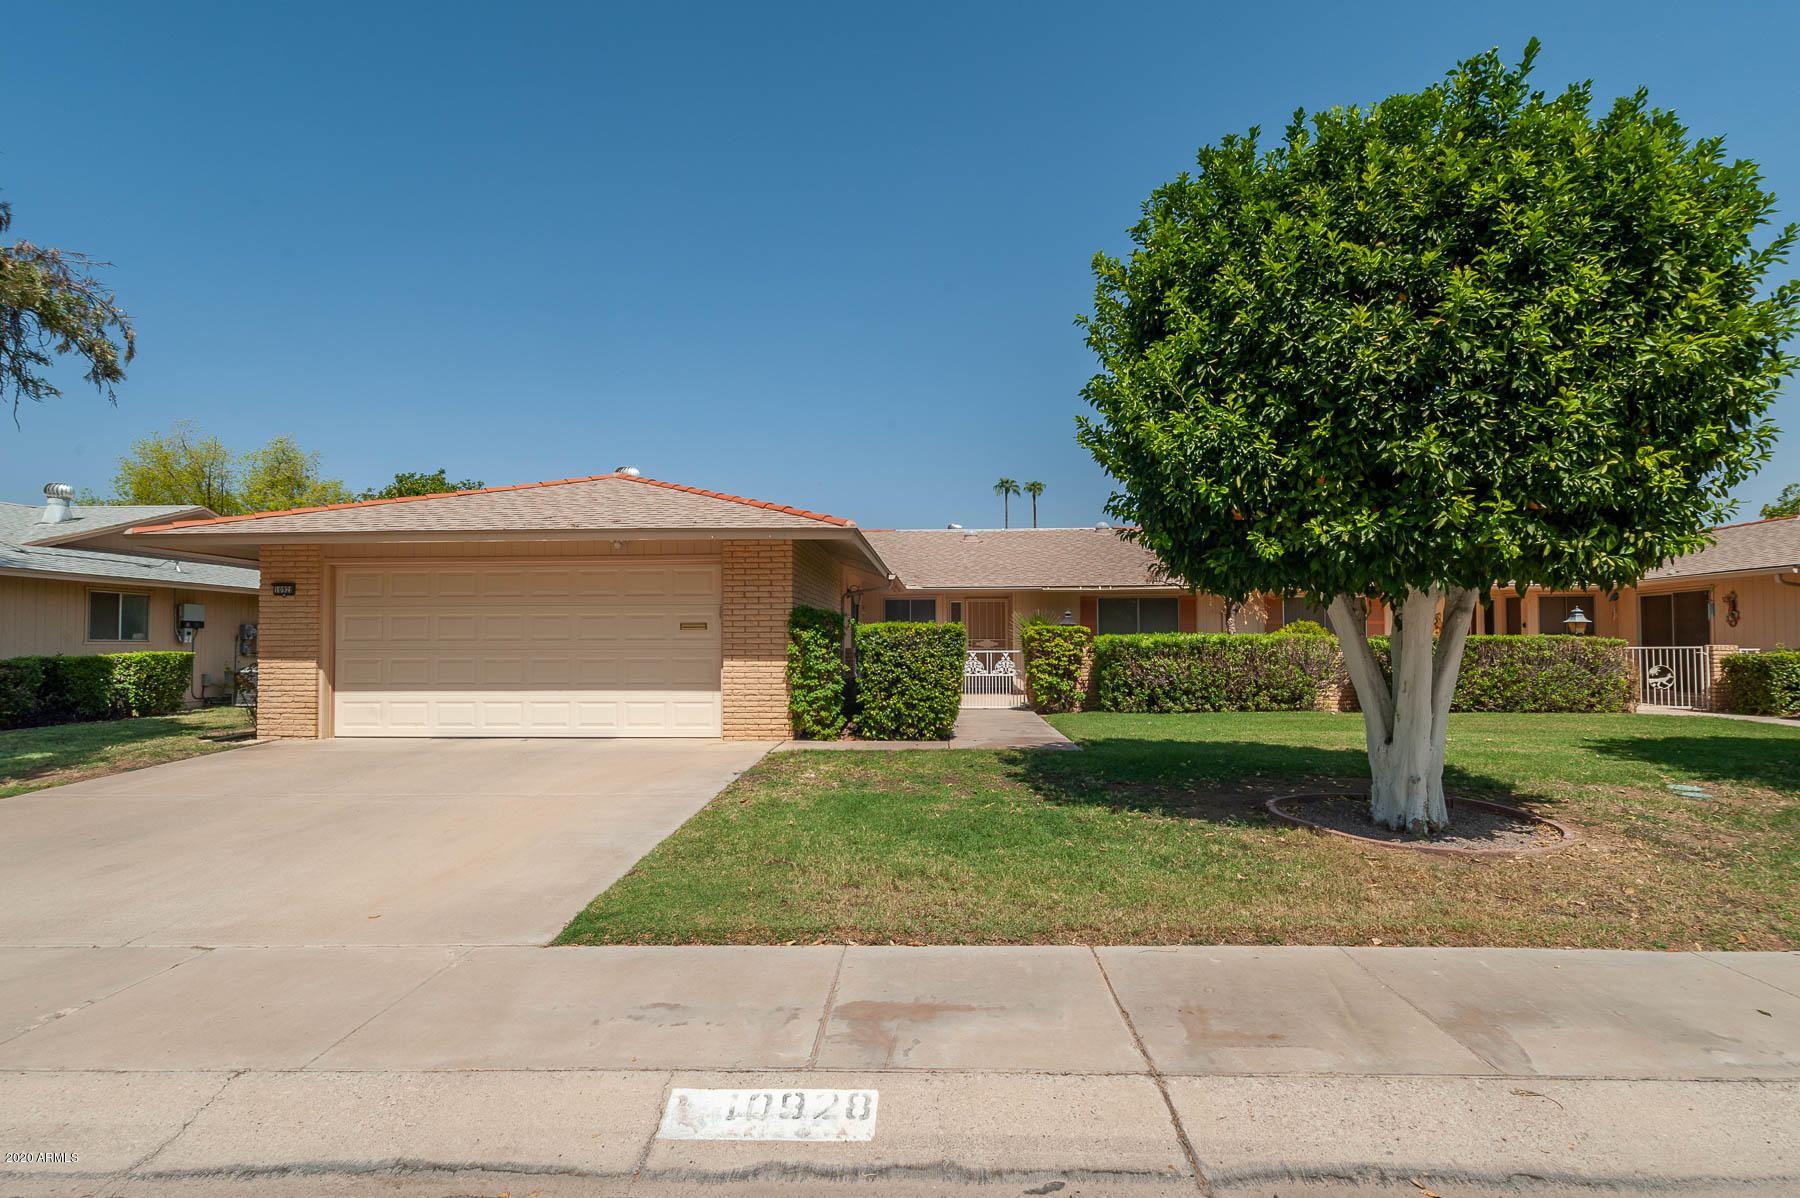 10928 W CARON Drive, Sun City, AZ 85351 - MLS#: 6133161